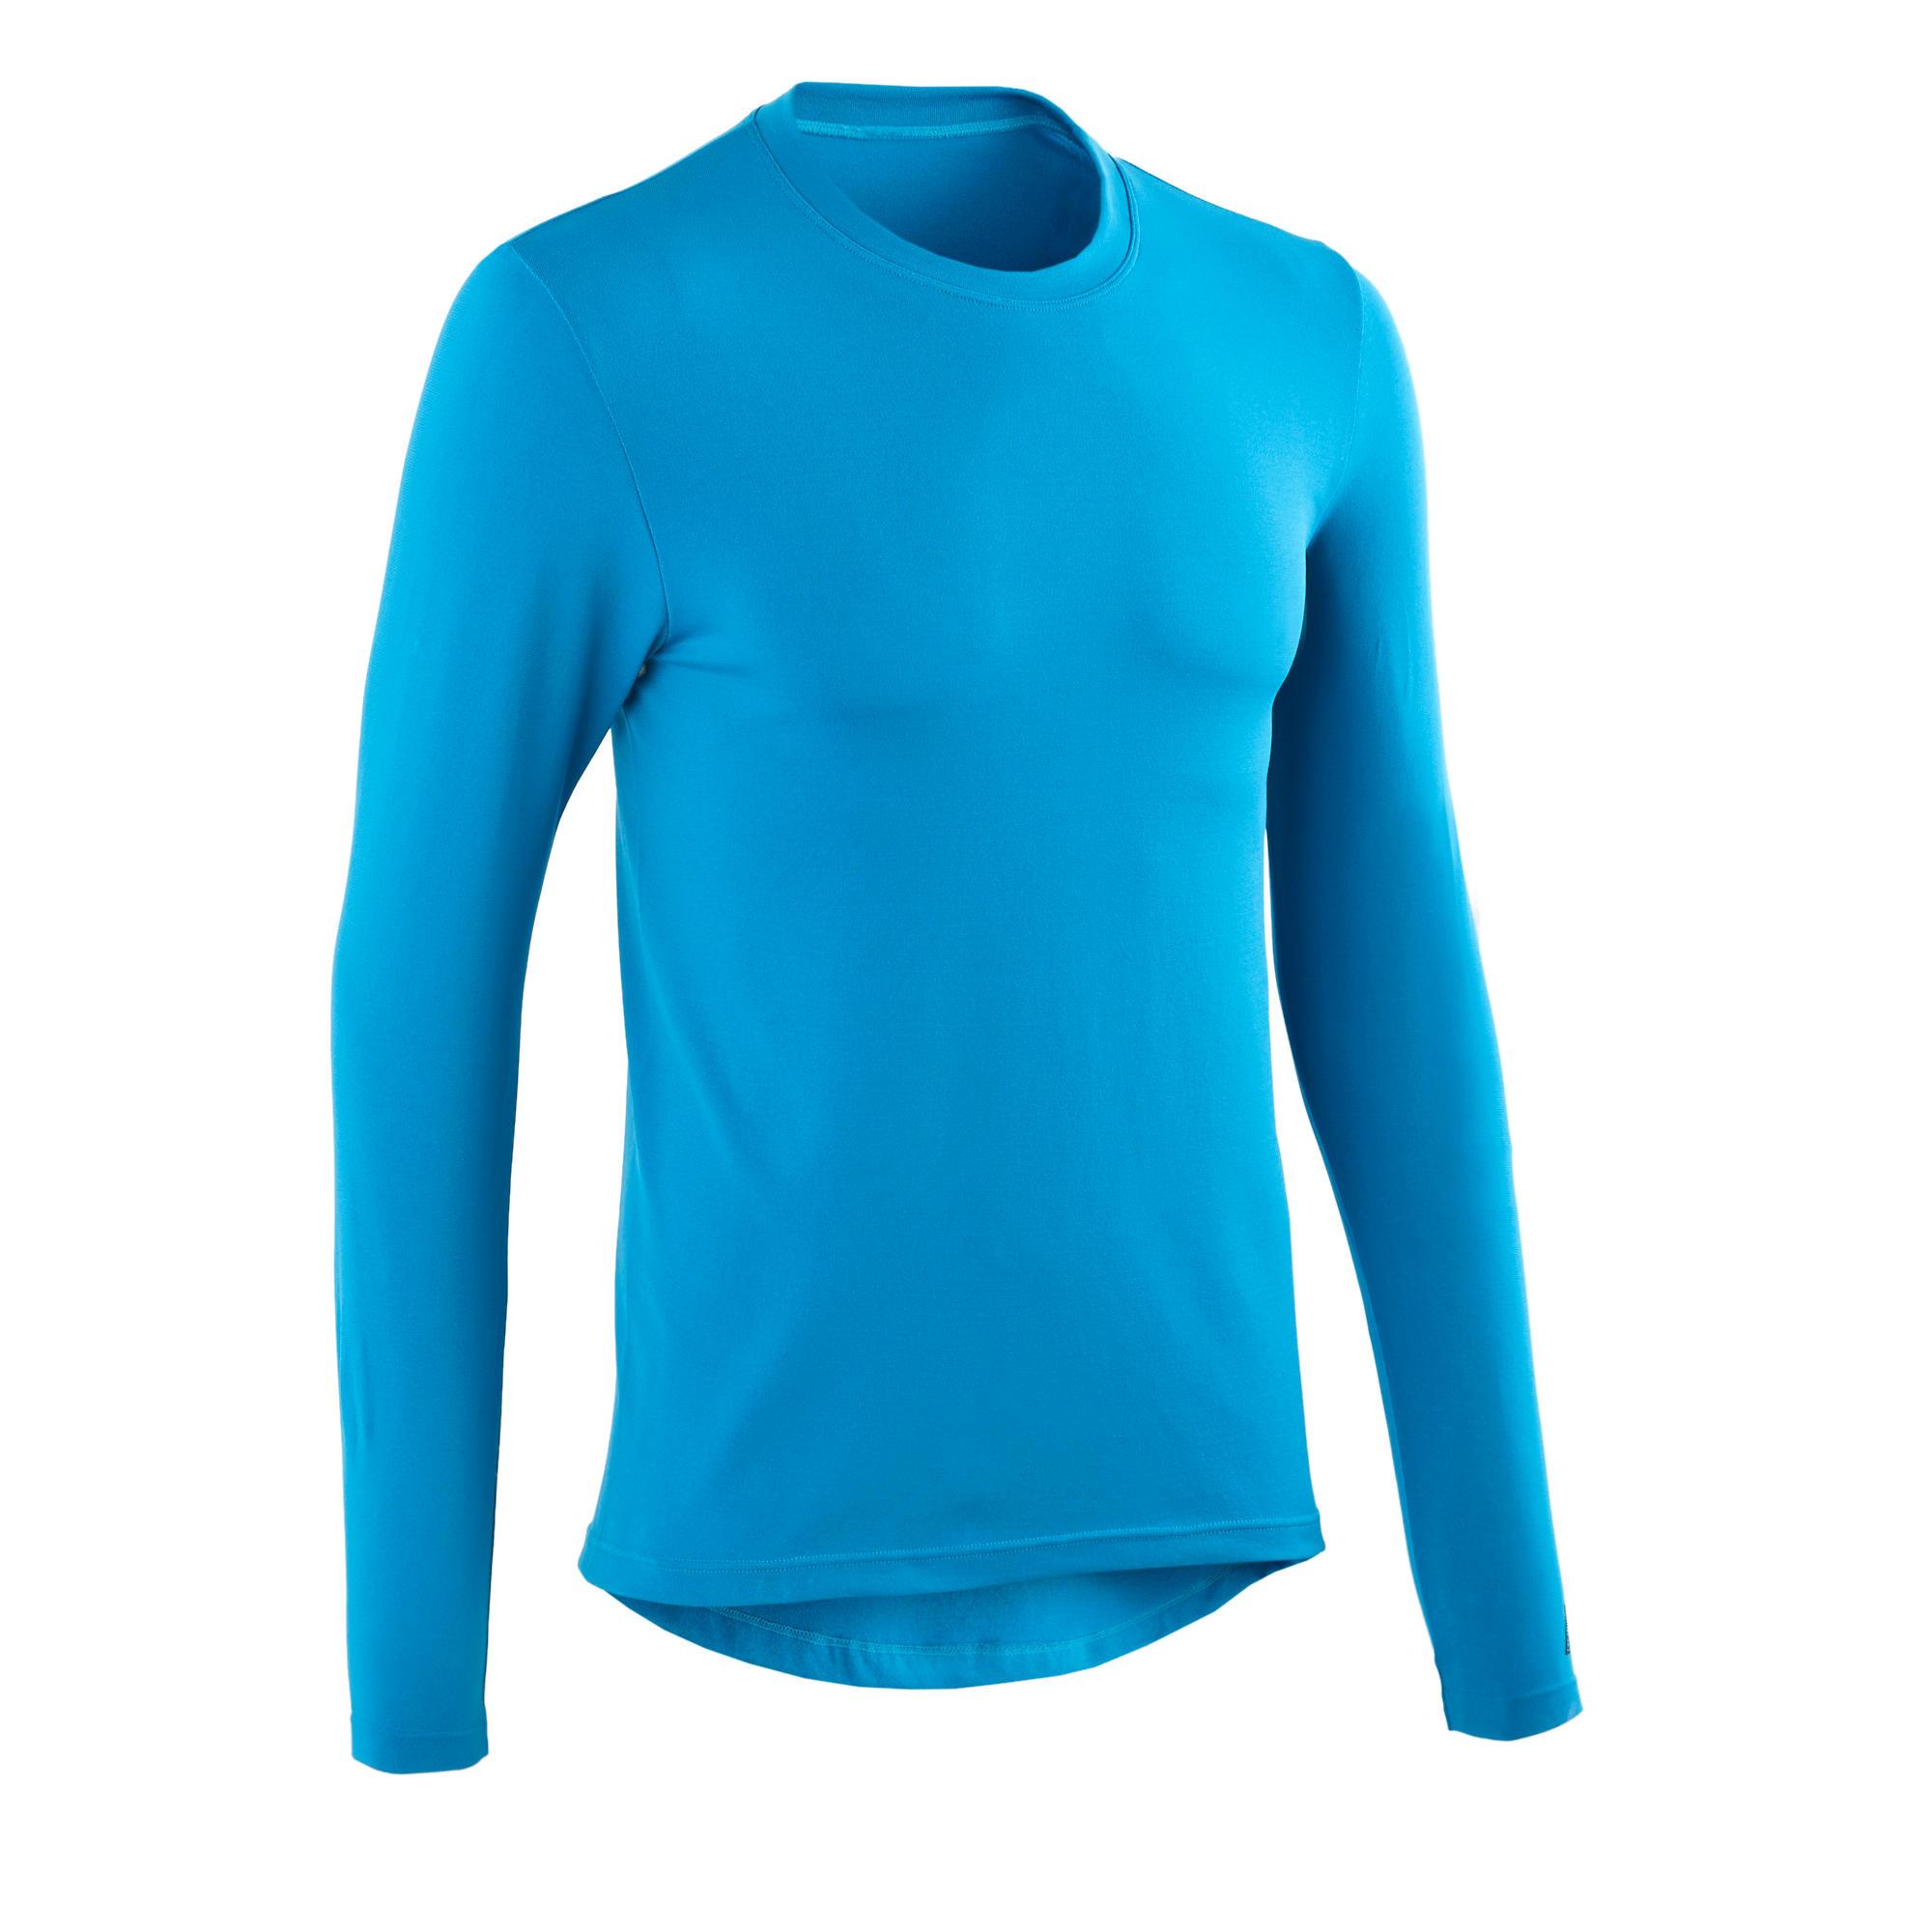 Bluză Ciclism 100 Turcoaz